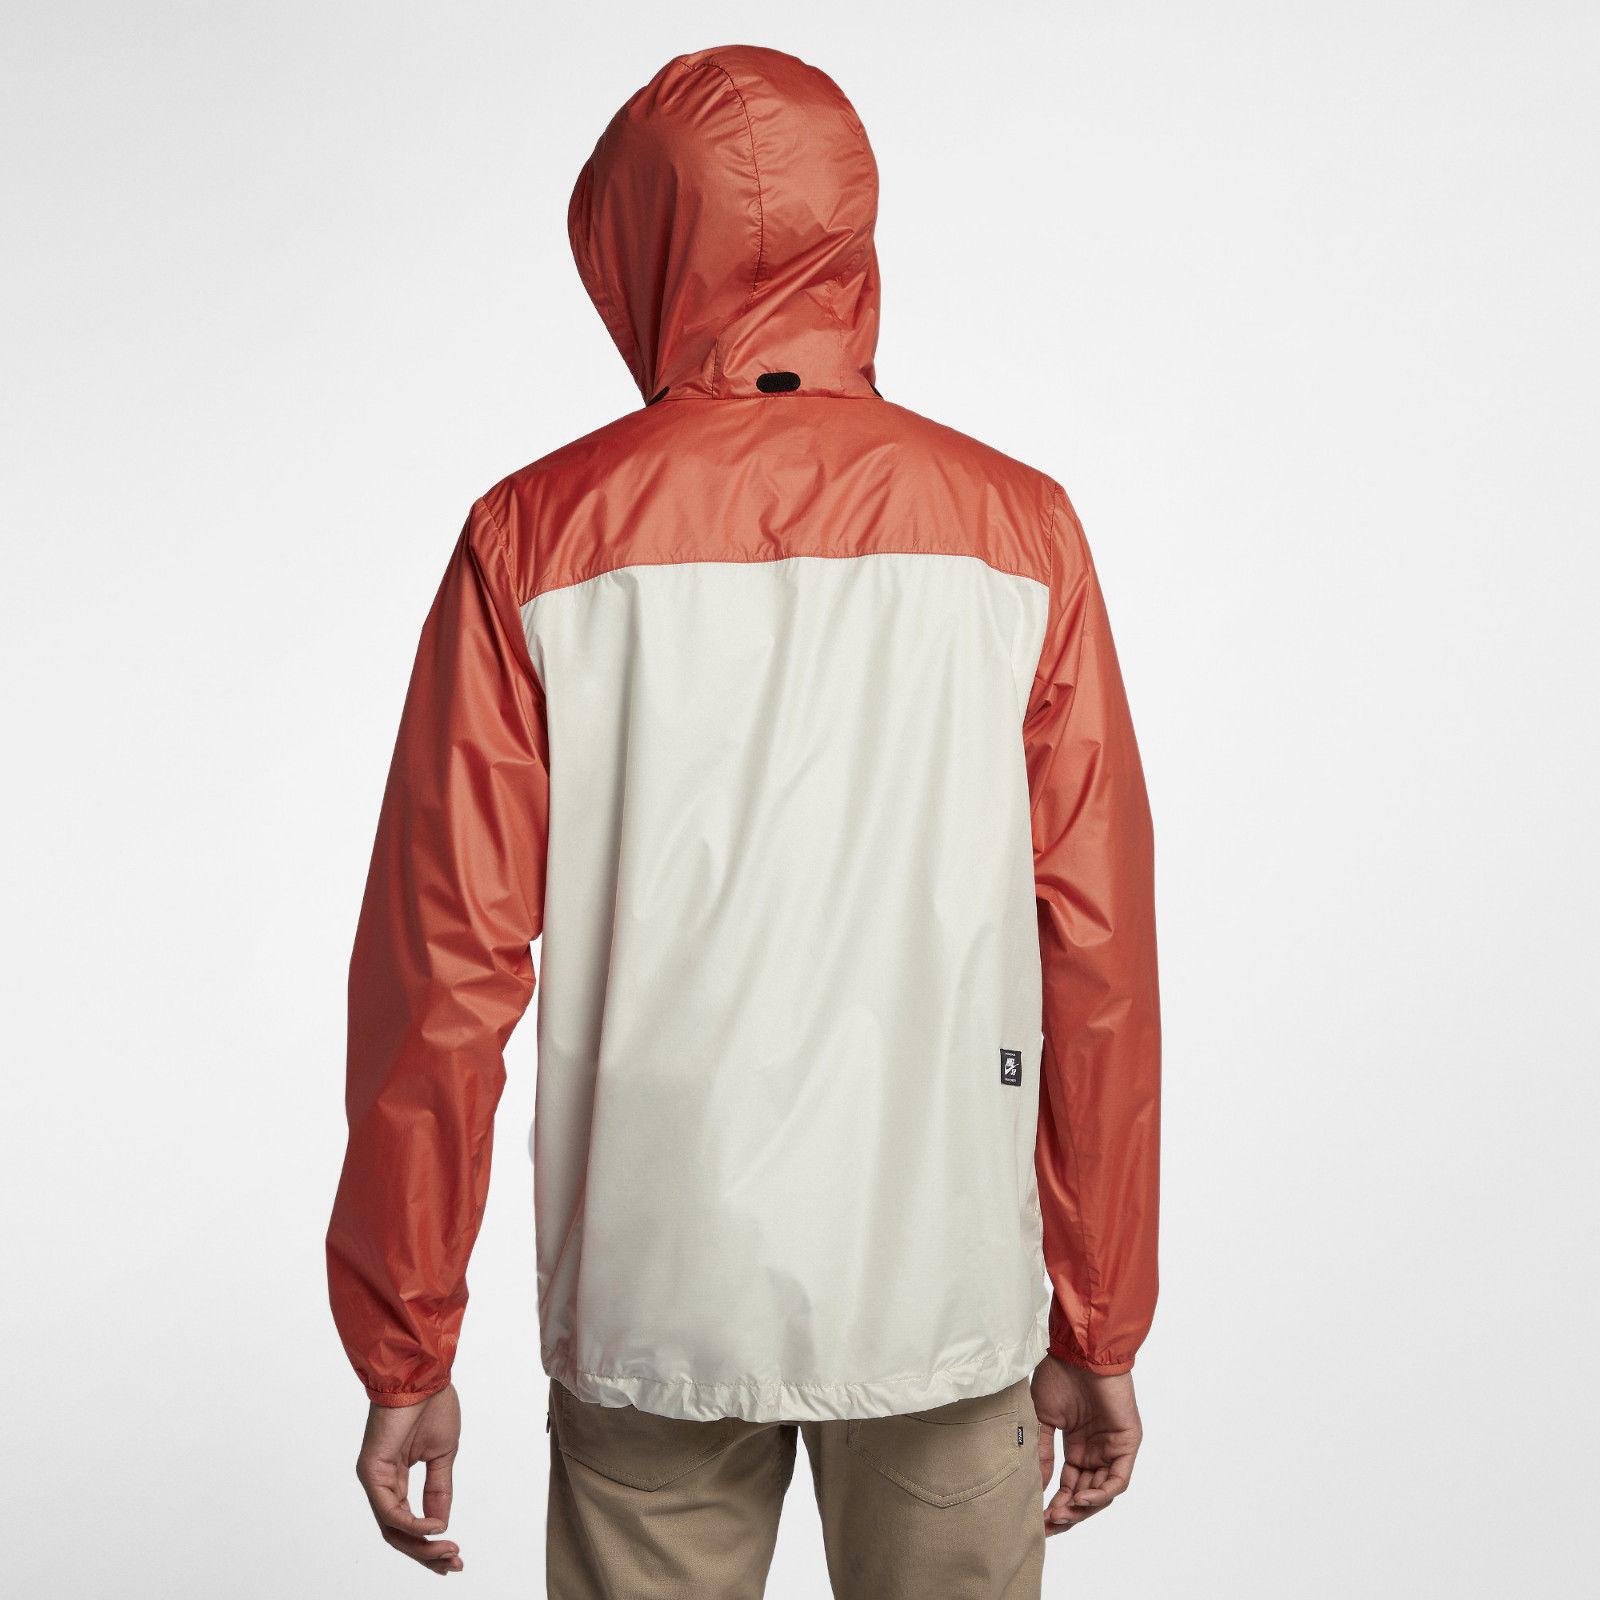 497de82370f9 Nike SB Anorak Men s Jacket Large 886110 and 50 similar items